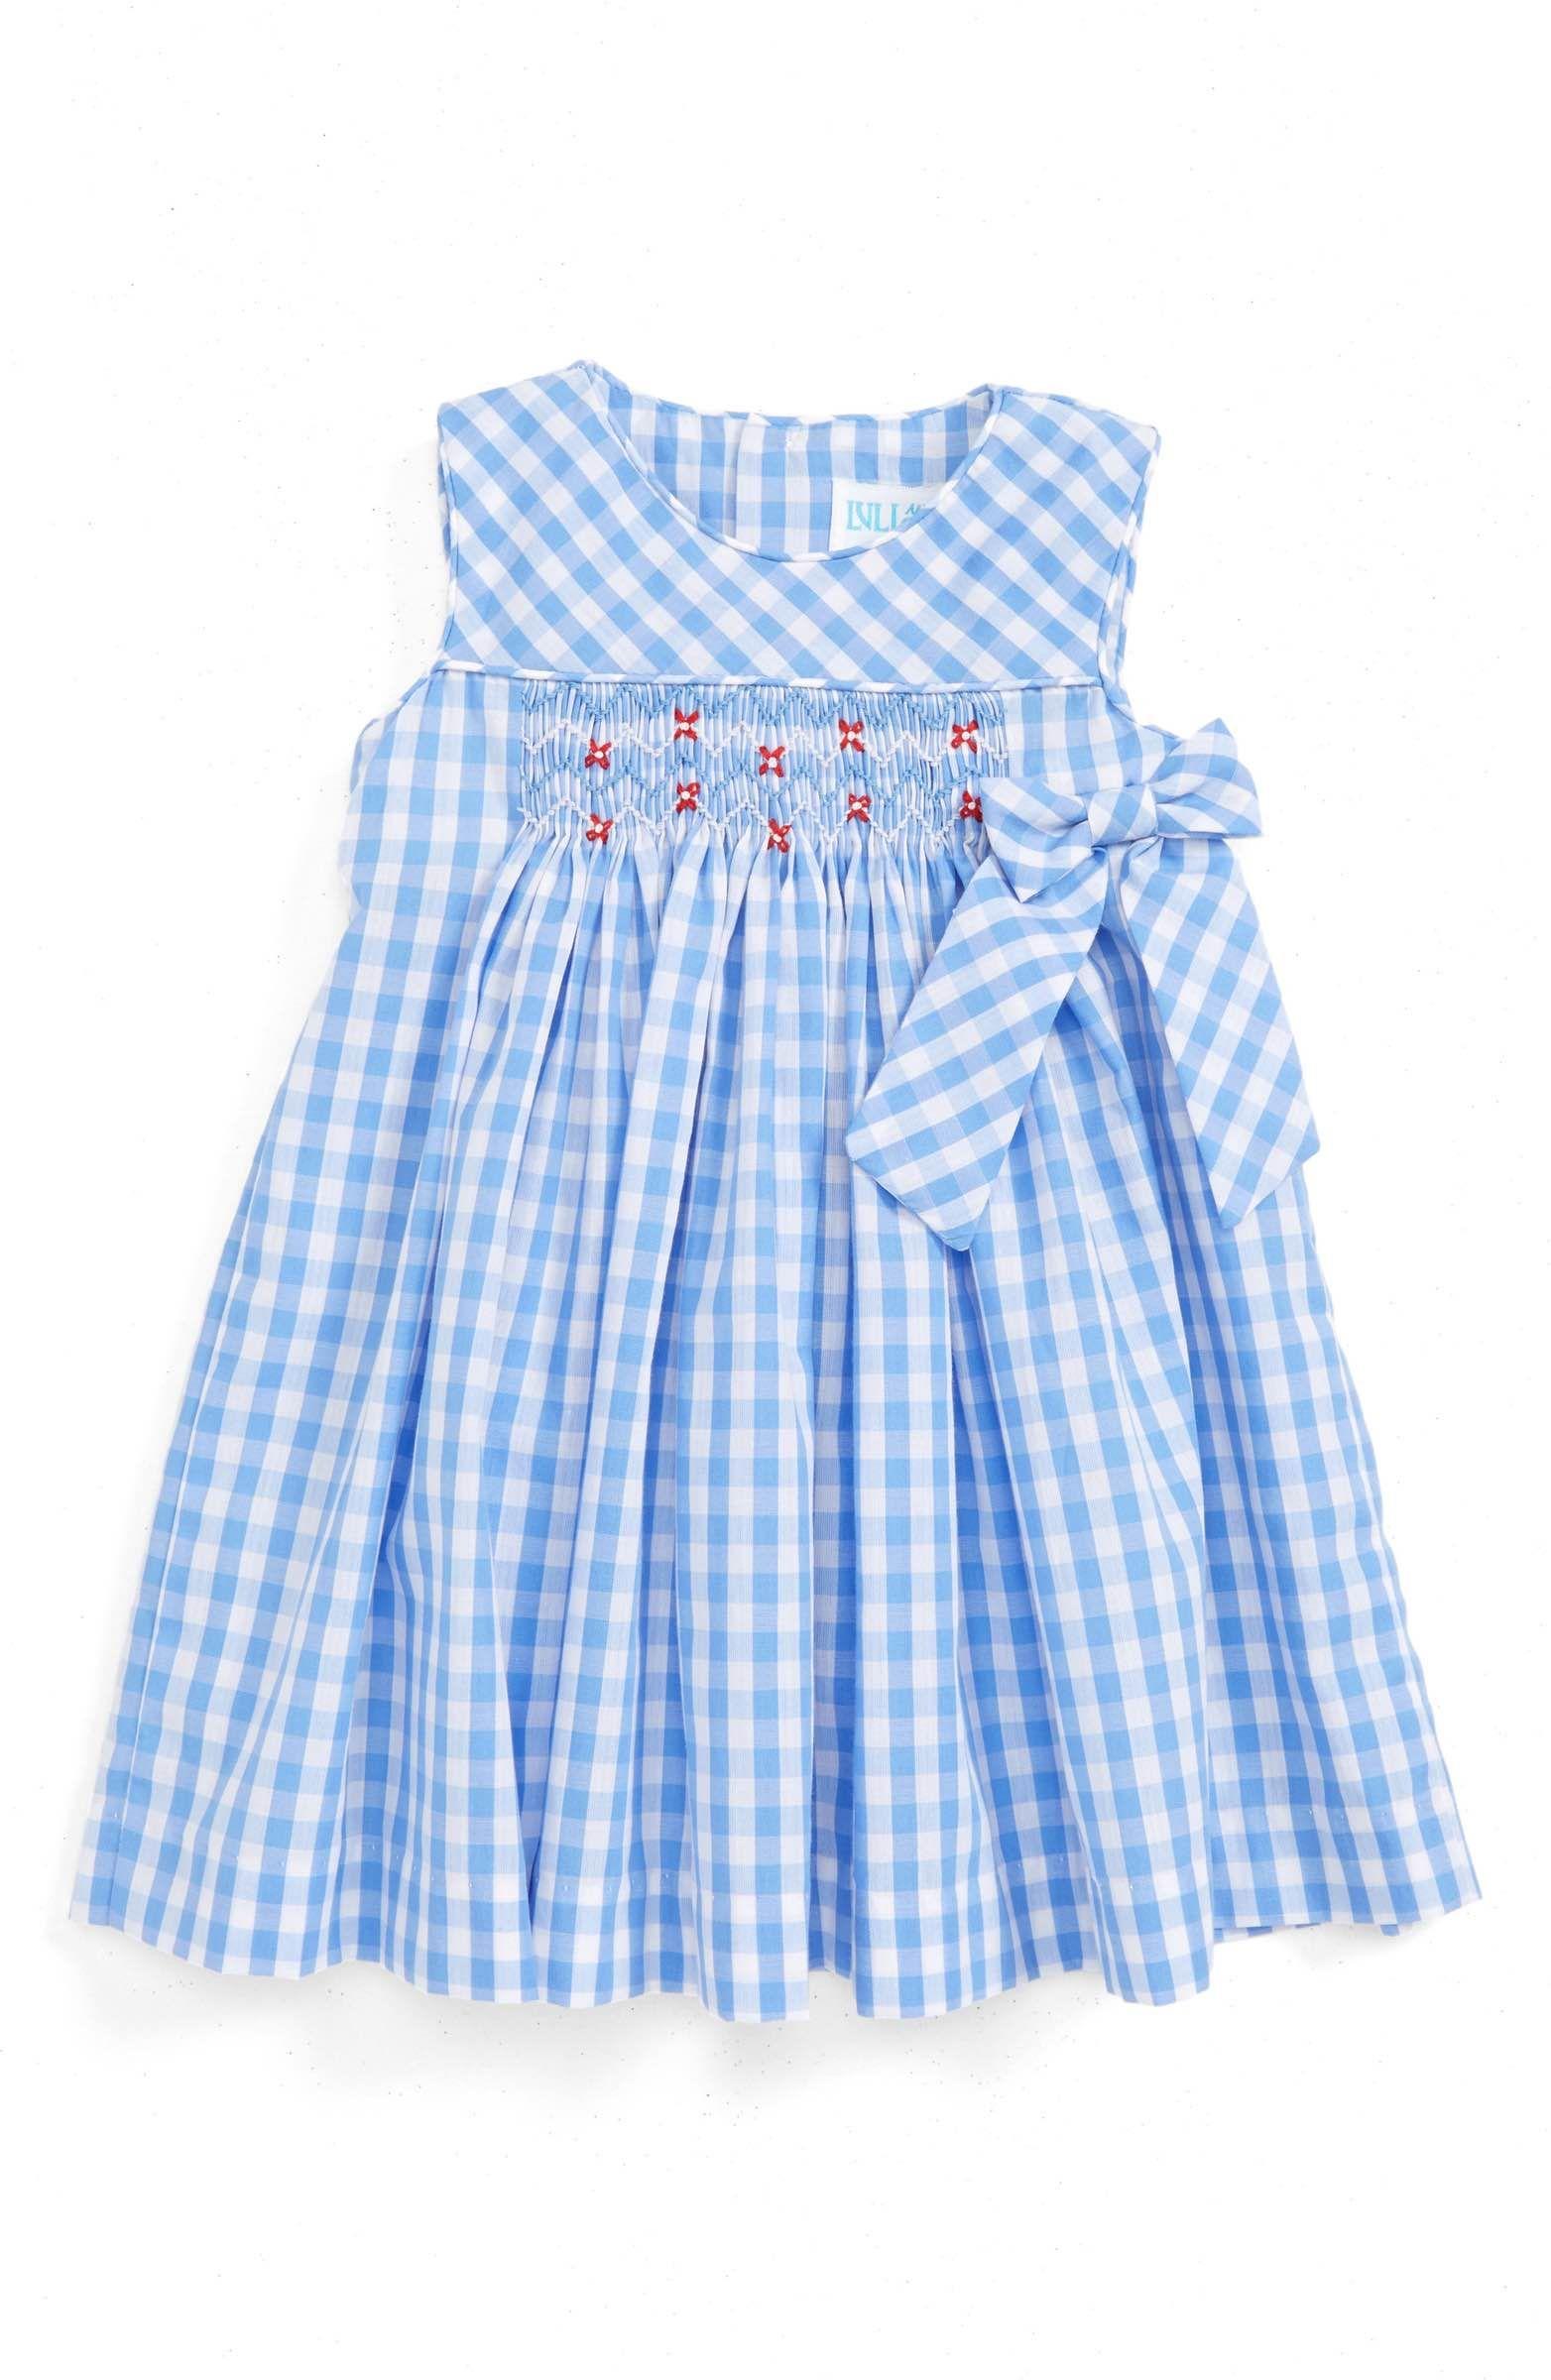 Main Image Luli & Me Gingham Check Smocked Dress Baby Girls